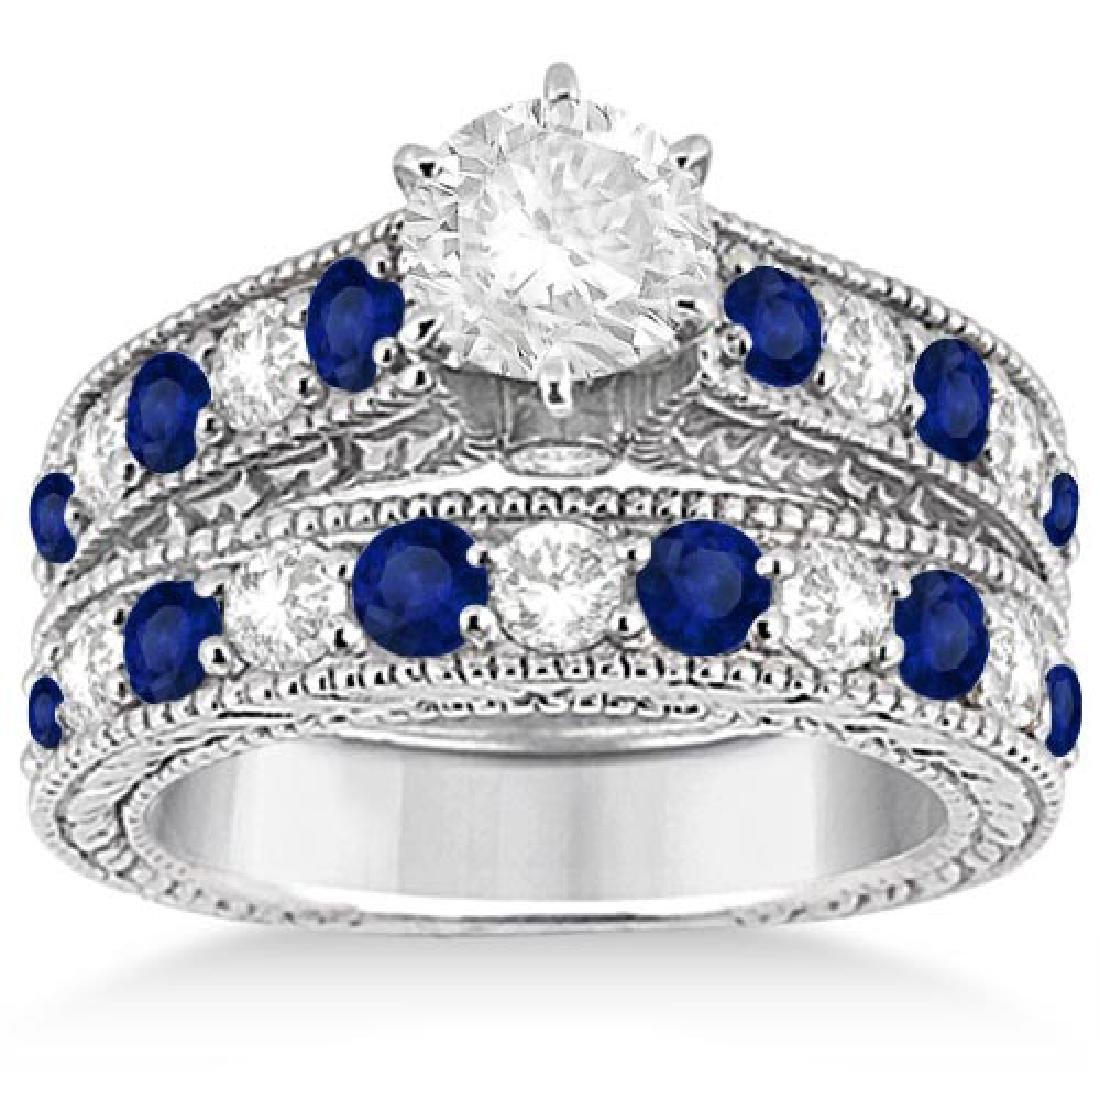 Antique Diamond and Sapphire Bridal Ring Set in Platinu